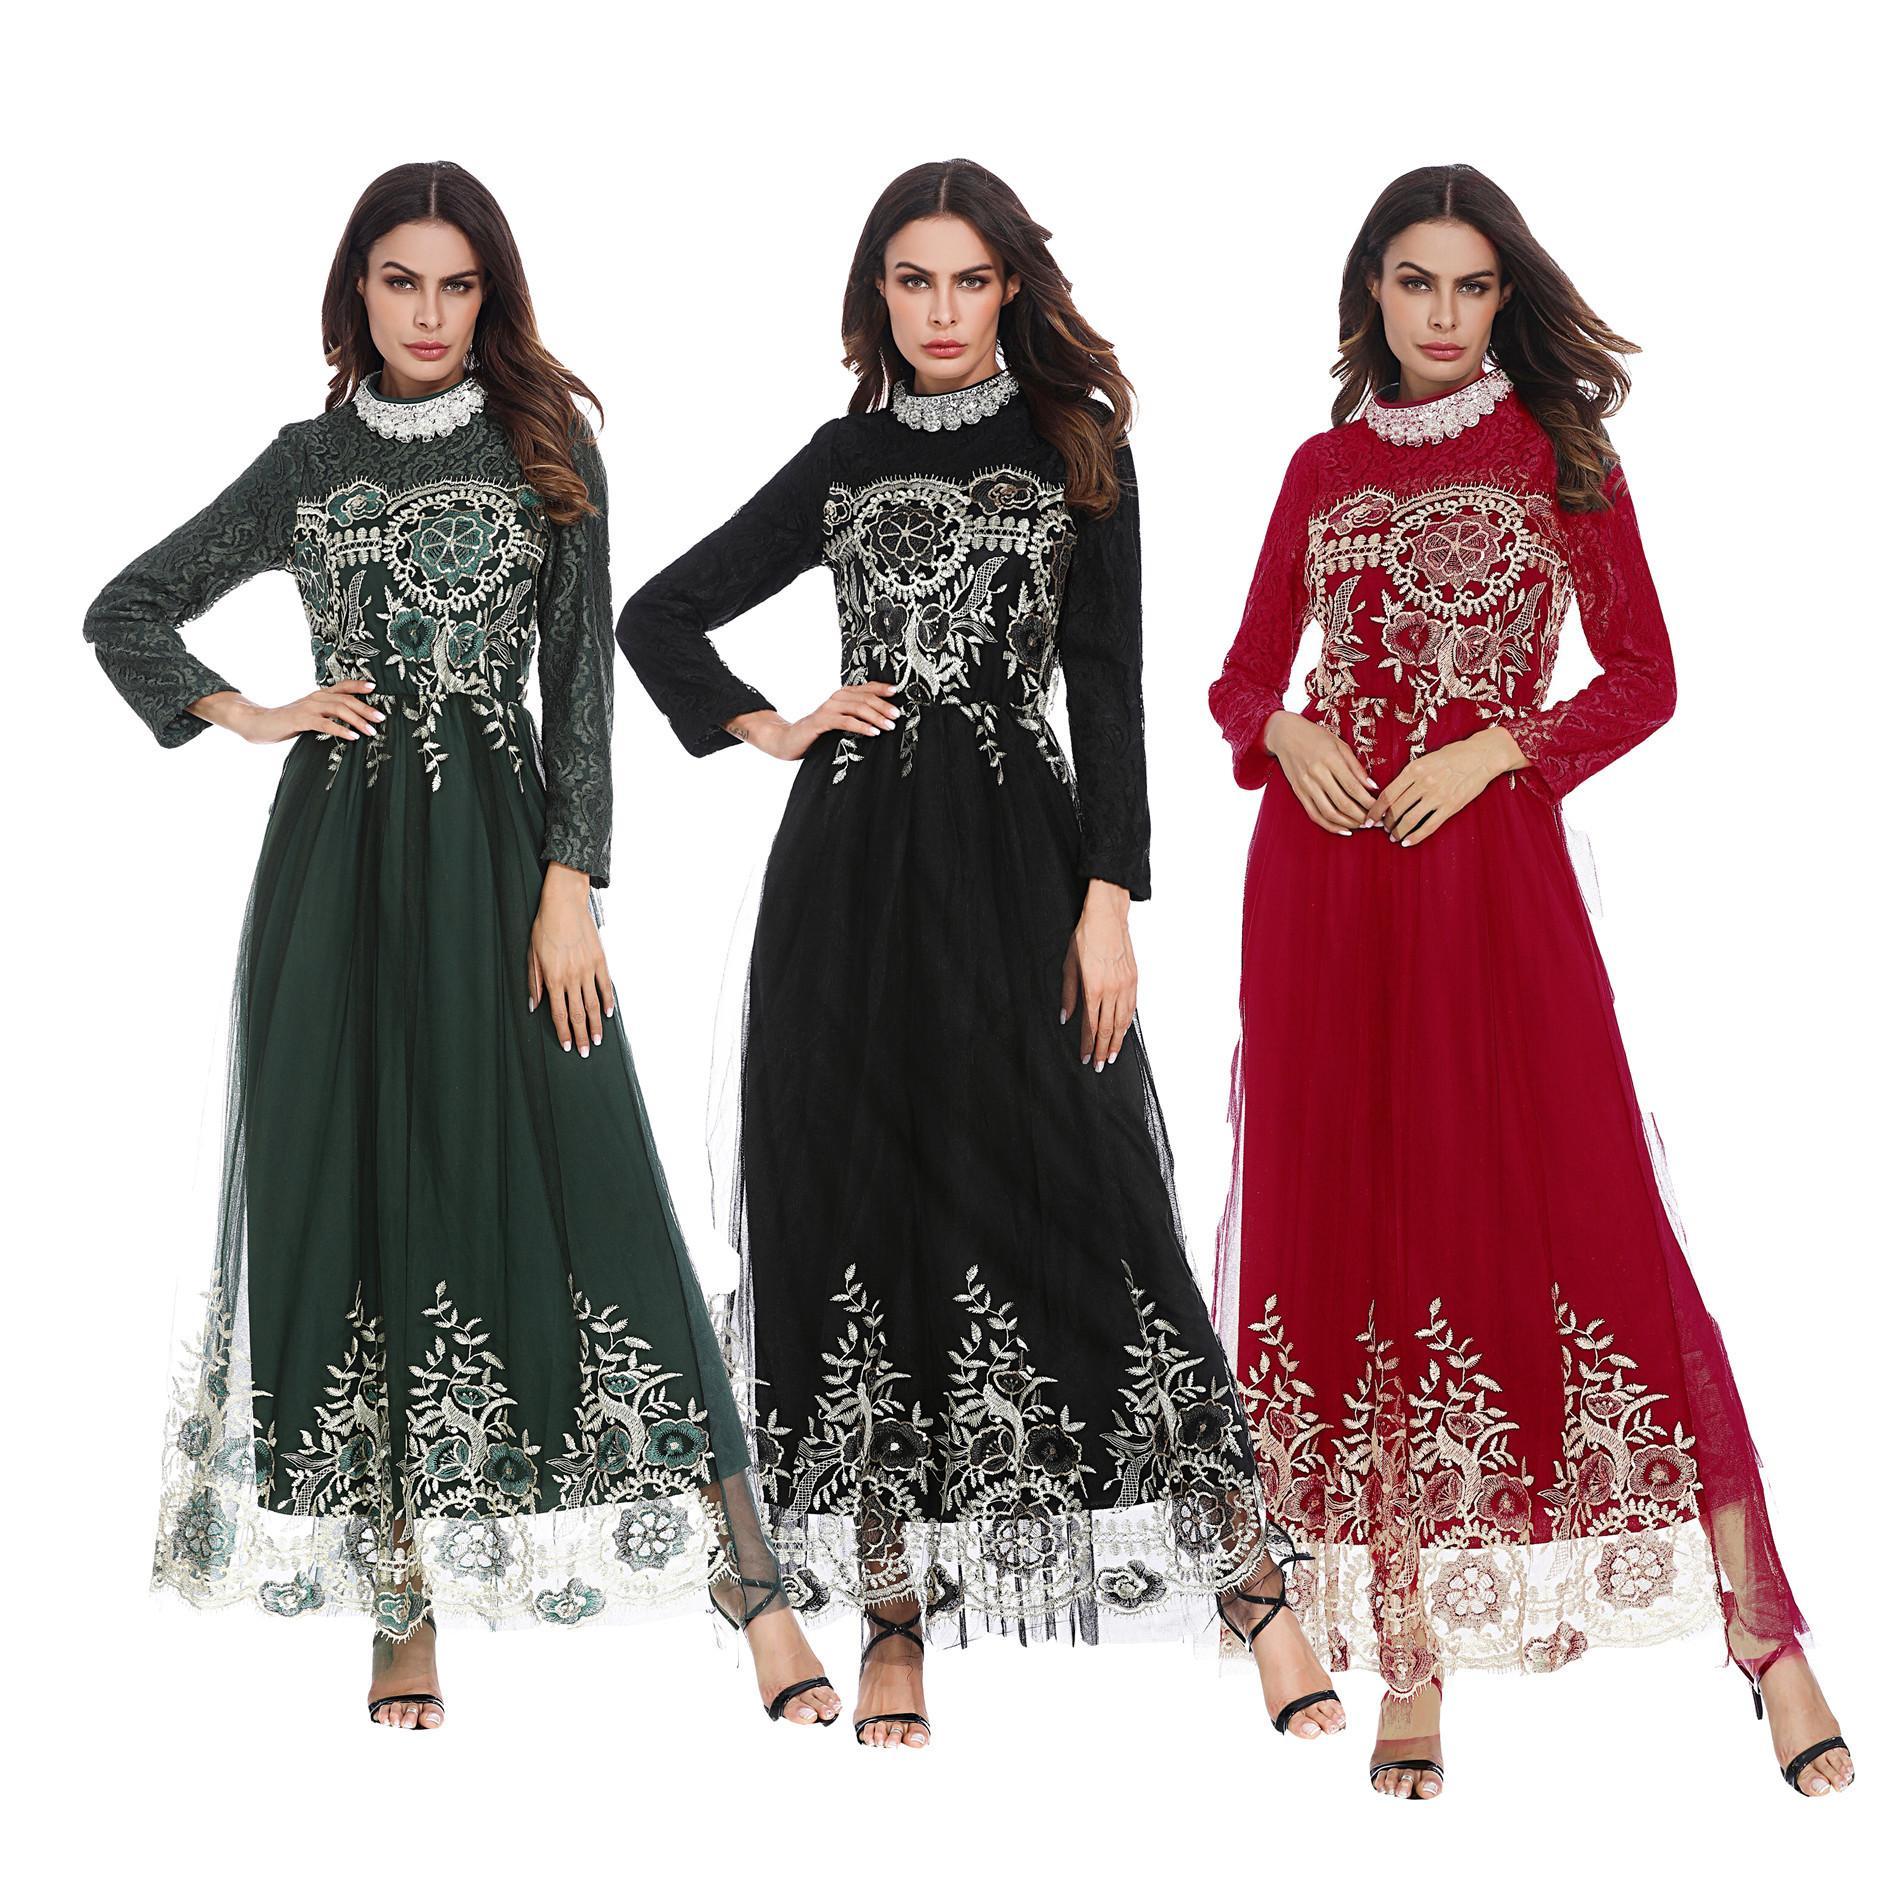 4b80ae599a2 Arabian Lace Mesh Paneled Maxi Dress Middle Eastern Muslim Bridesmaid Dress  Womens Crew Neck Flora Panelled Dress Long Evening Dress Red Evening Dress  From ...